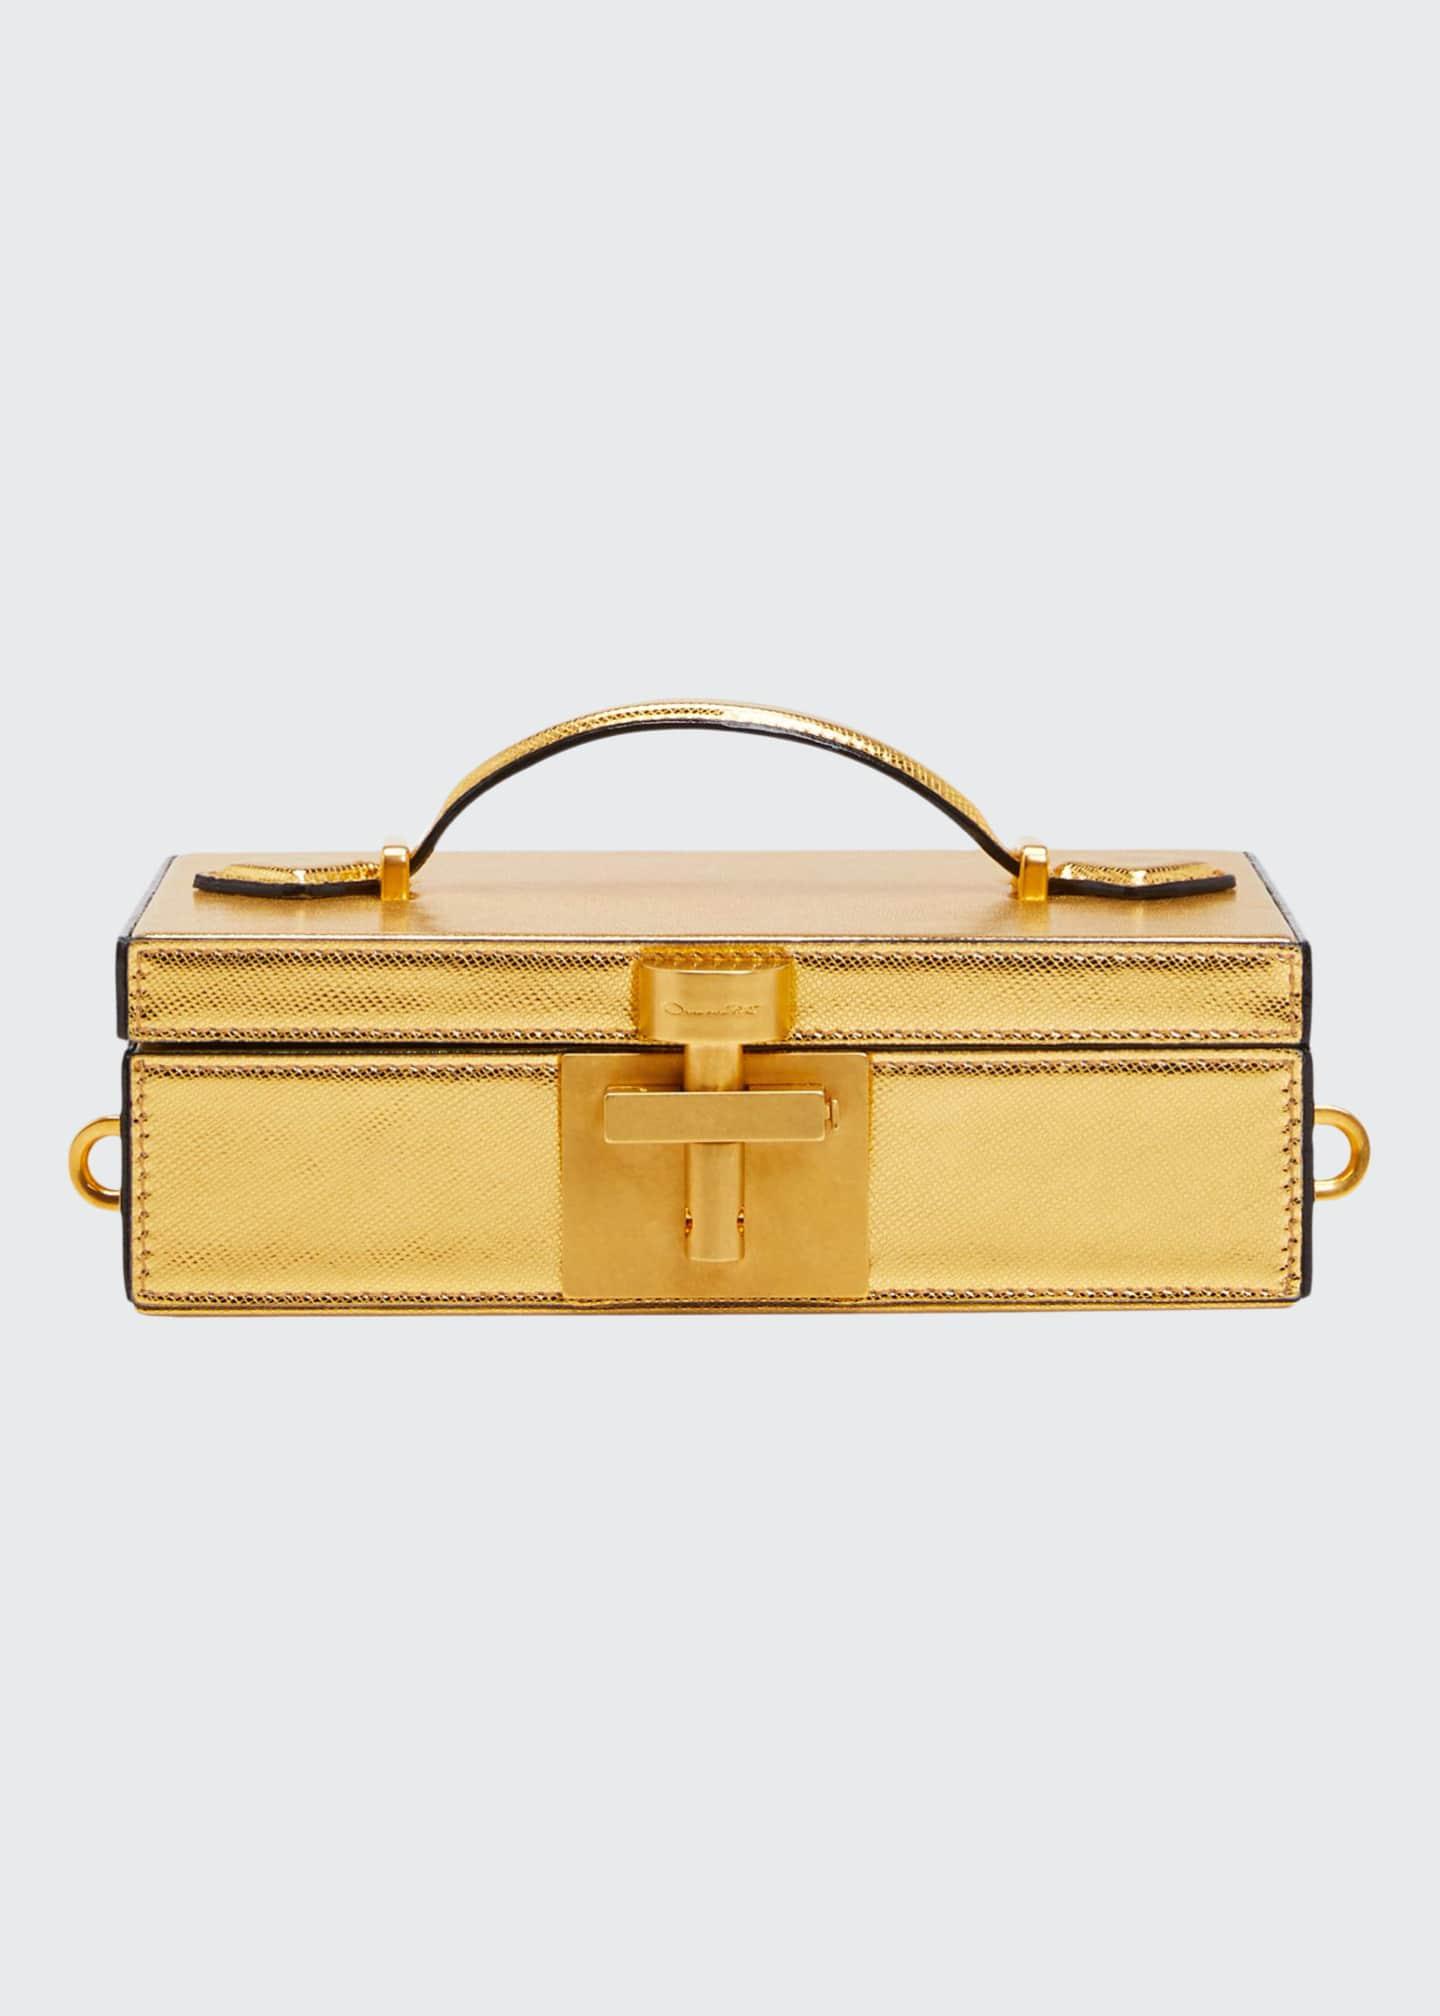 Oscar de la Renta Alibi Framed Minaudiere Bag,